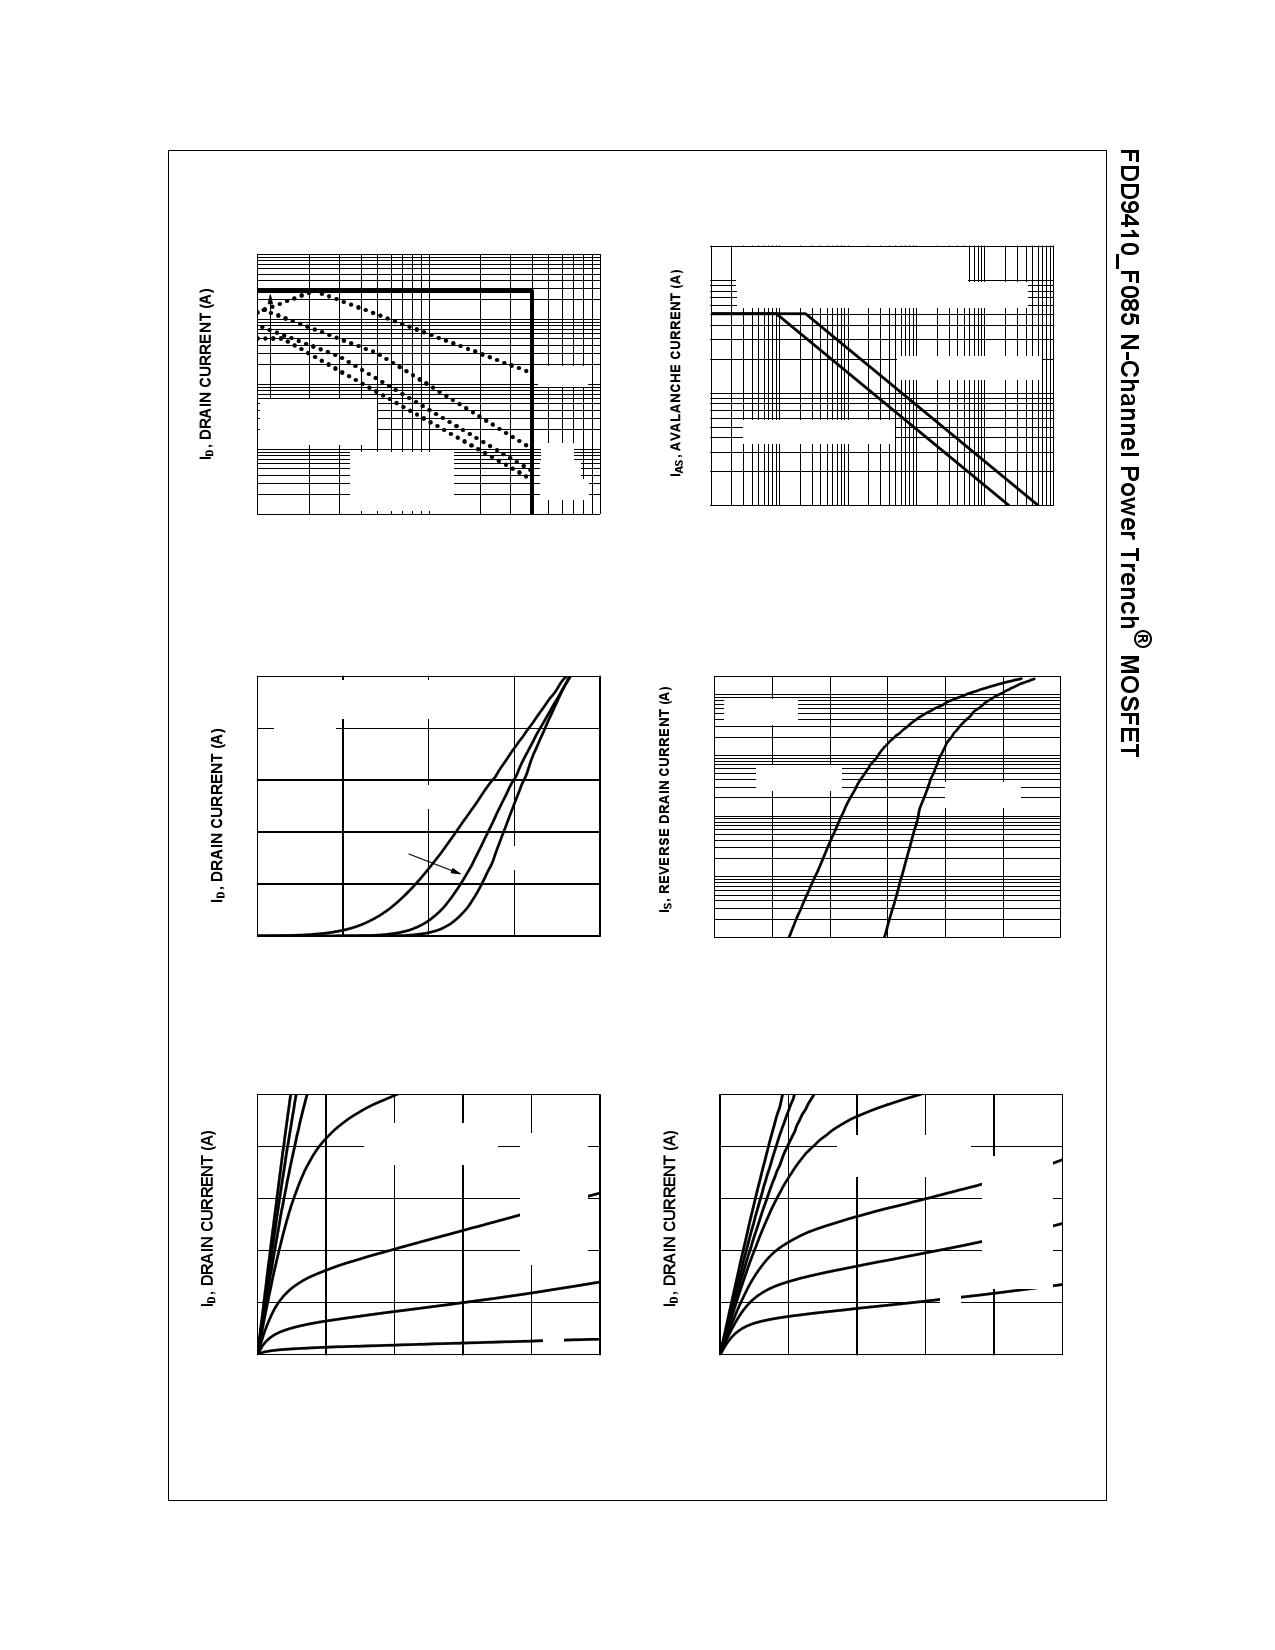 FDD9410_F085 pdf, 반도체, 판매, 대치품